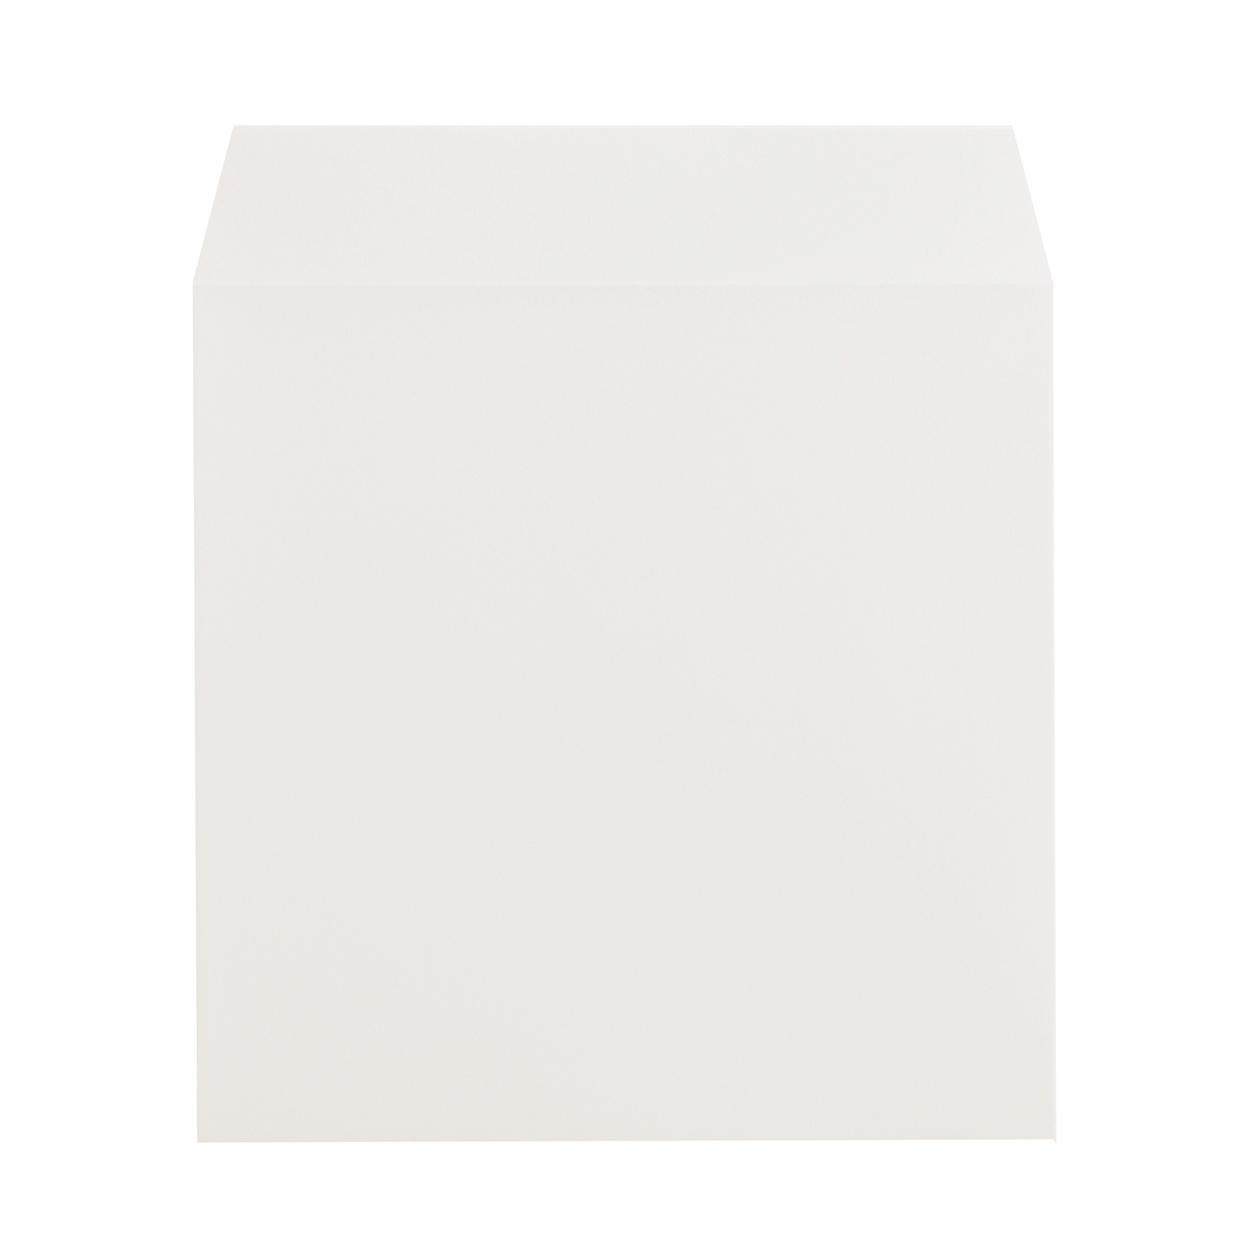 SE22封筒 コットン スノーホワイト 116.3g